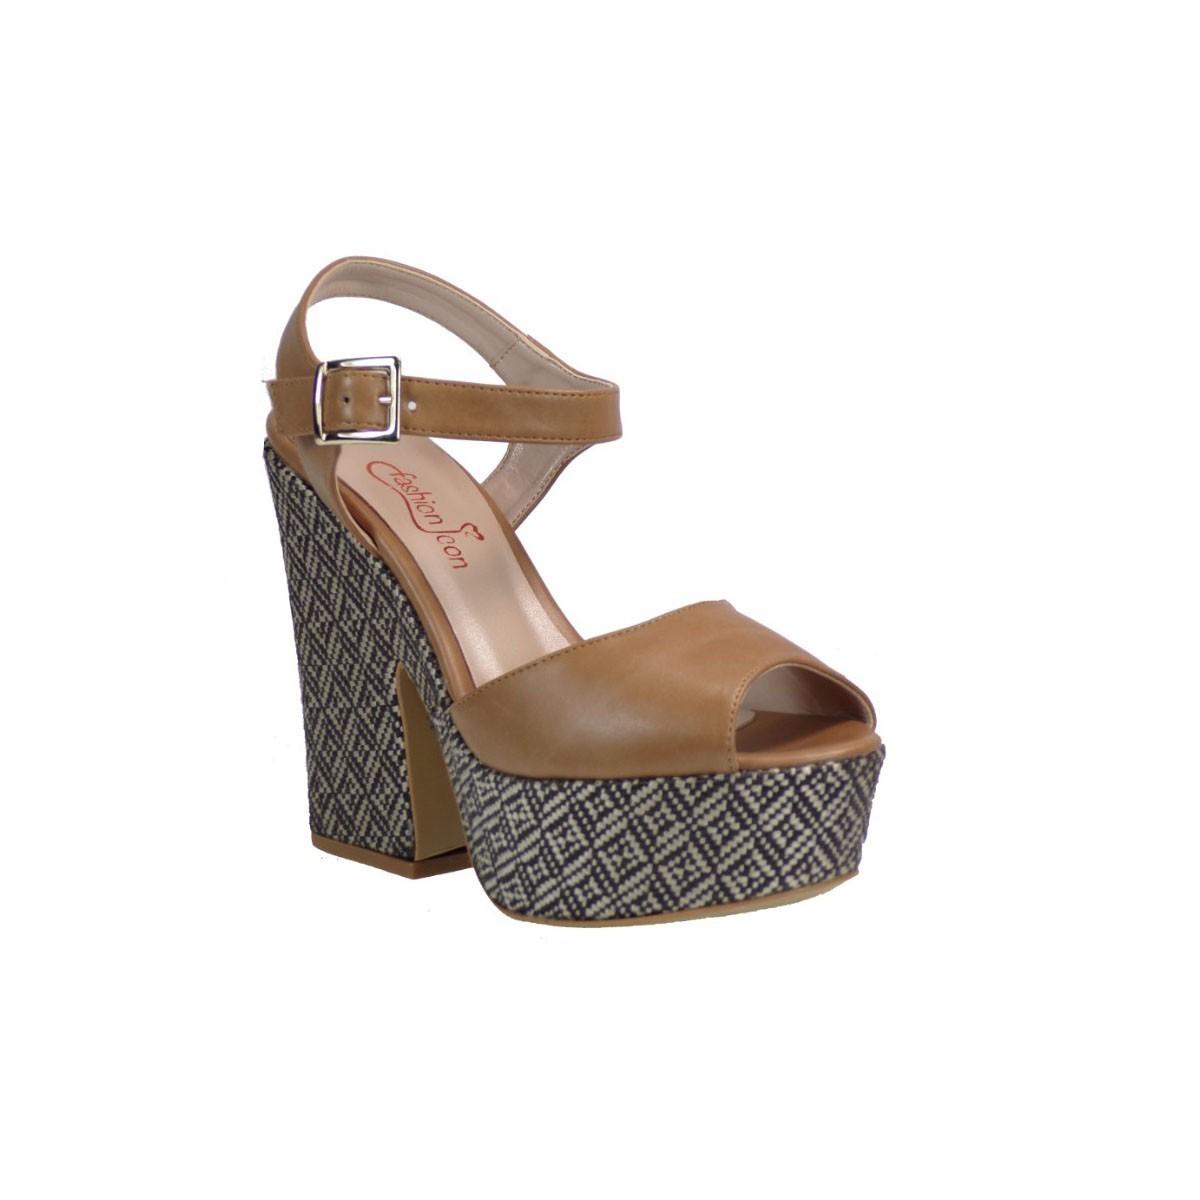 Fashion Icon Γυναικεία Παπούτσια Πέδιλα F09-05653 Κάμελ Fashio icon F09-05653 Κάμελ